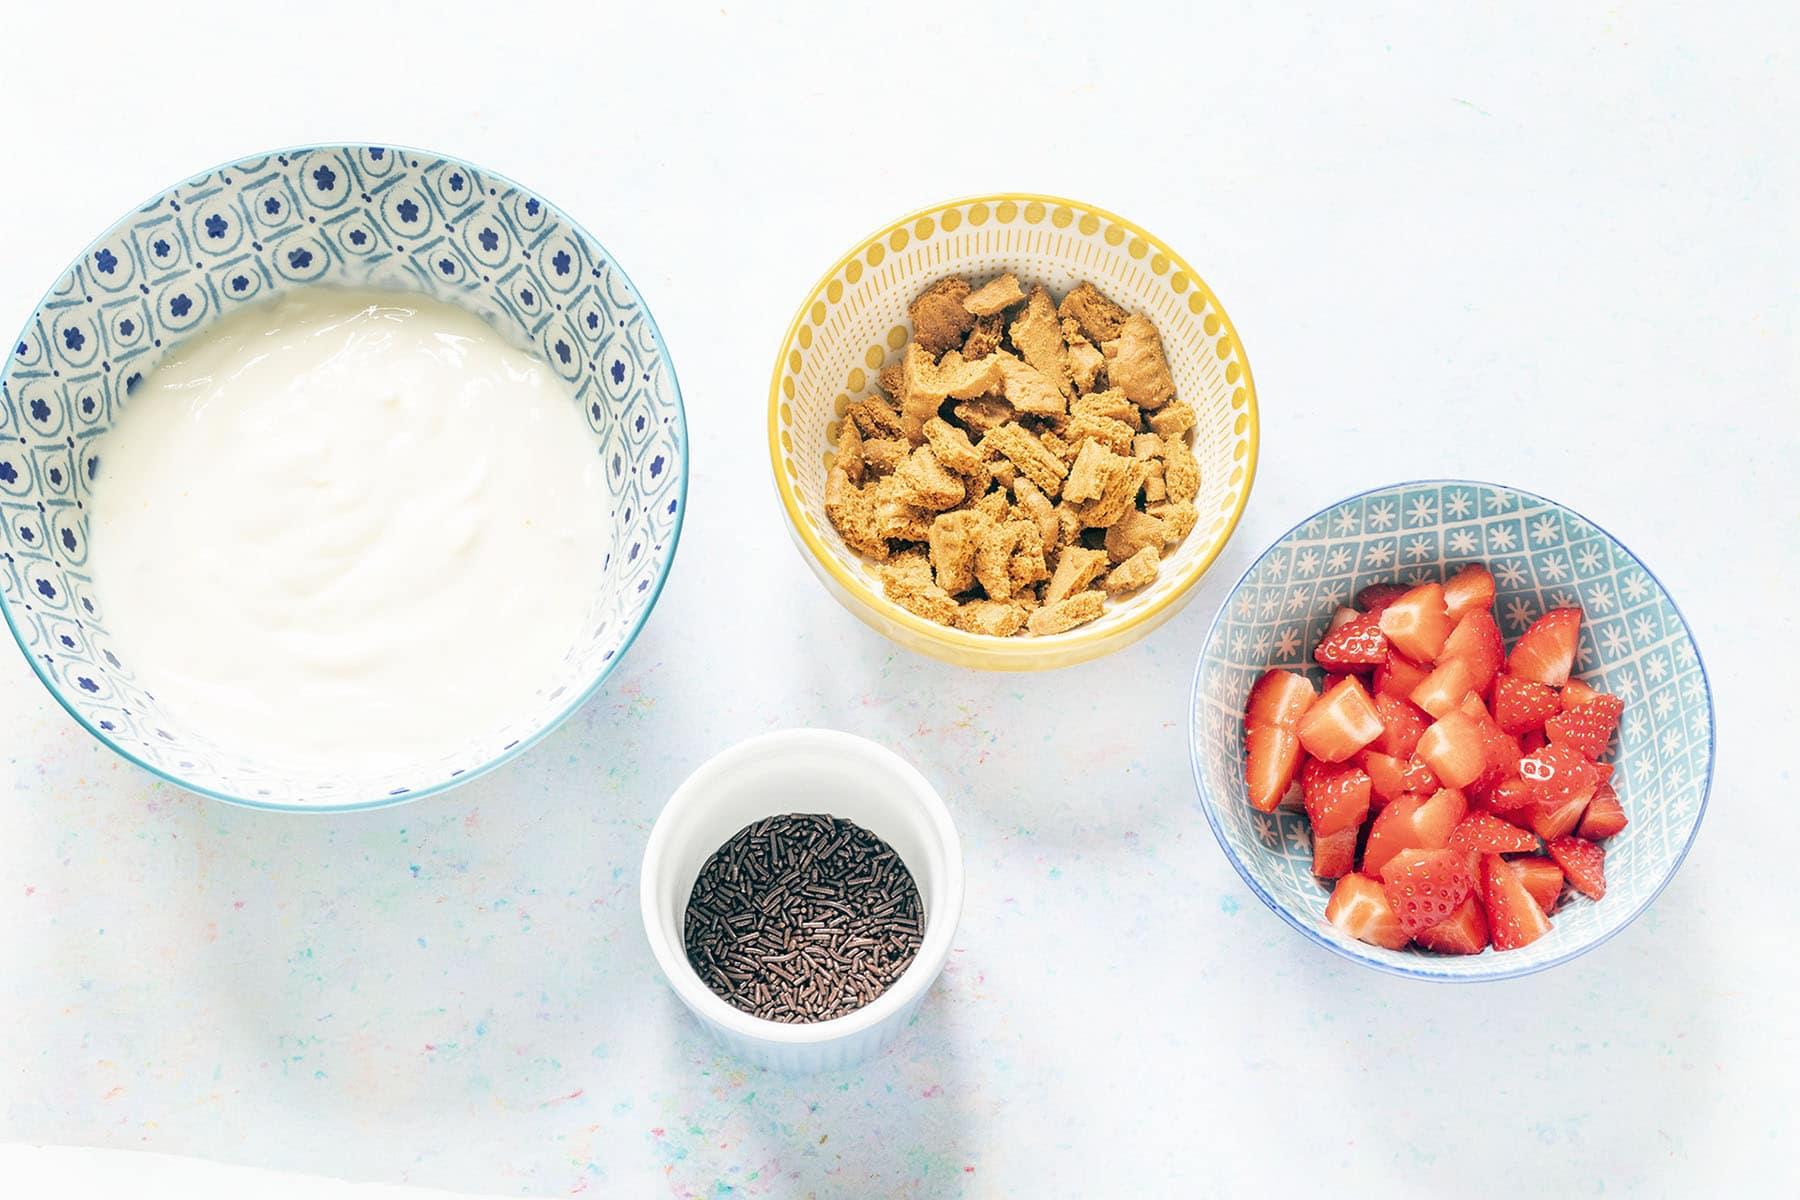 ingredients for yoghurt parfait